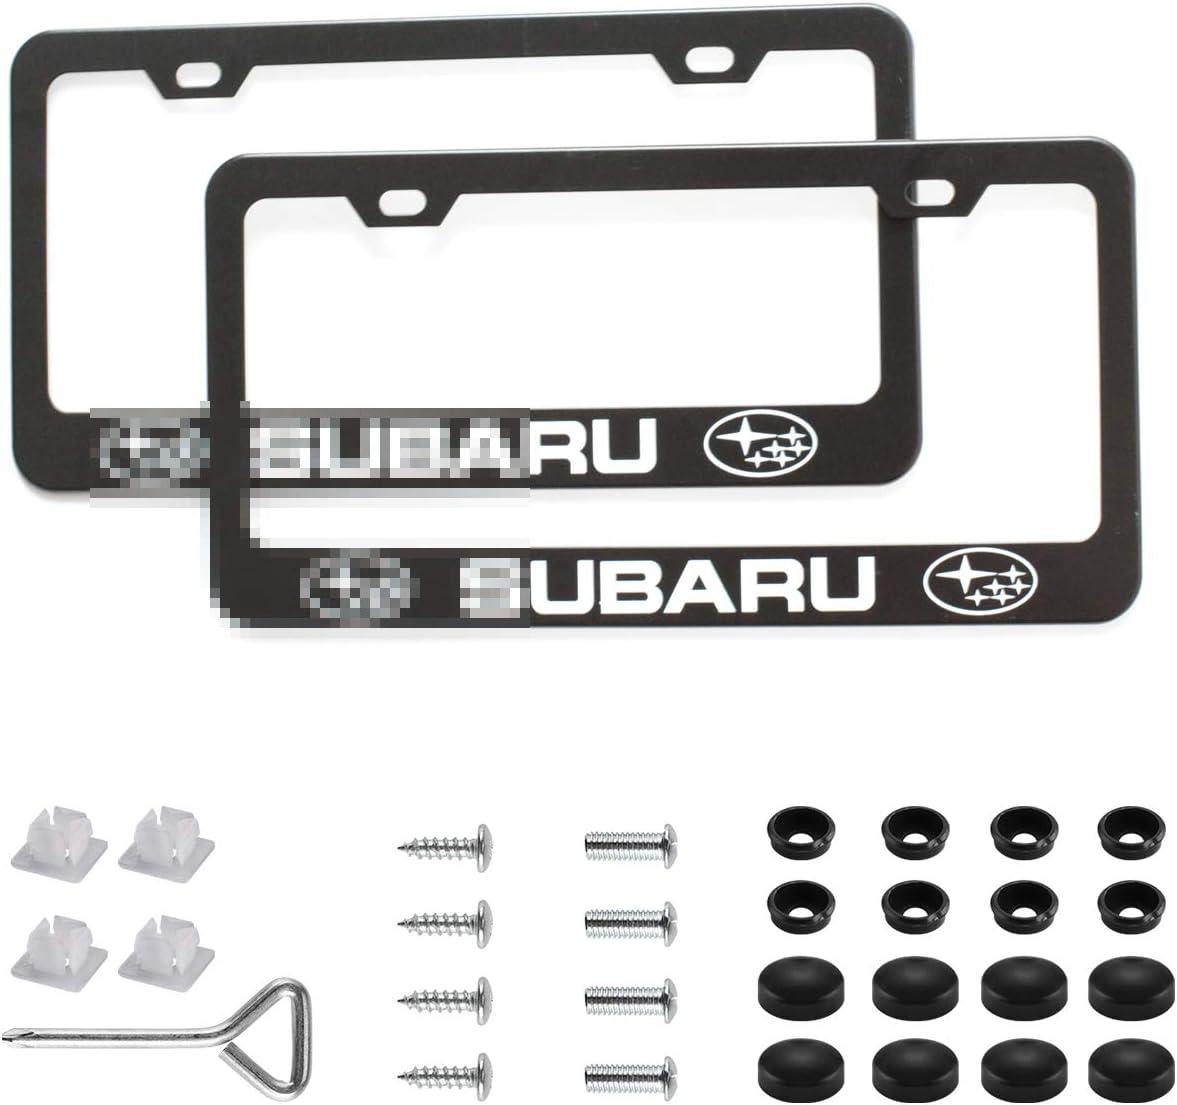 2Pcs Newest Matte Aluminum Alloy Subaru Logo License Plate Frame,with Screw Caps Cover Set,Applicable to US Standard car License Frame, for Subaru(Matte Black)